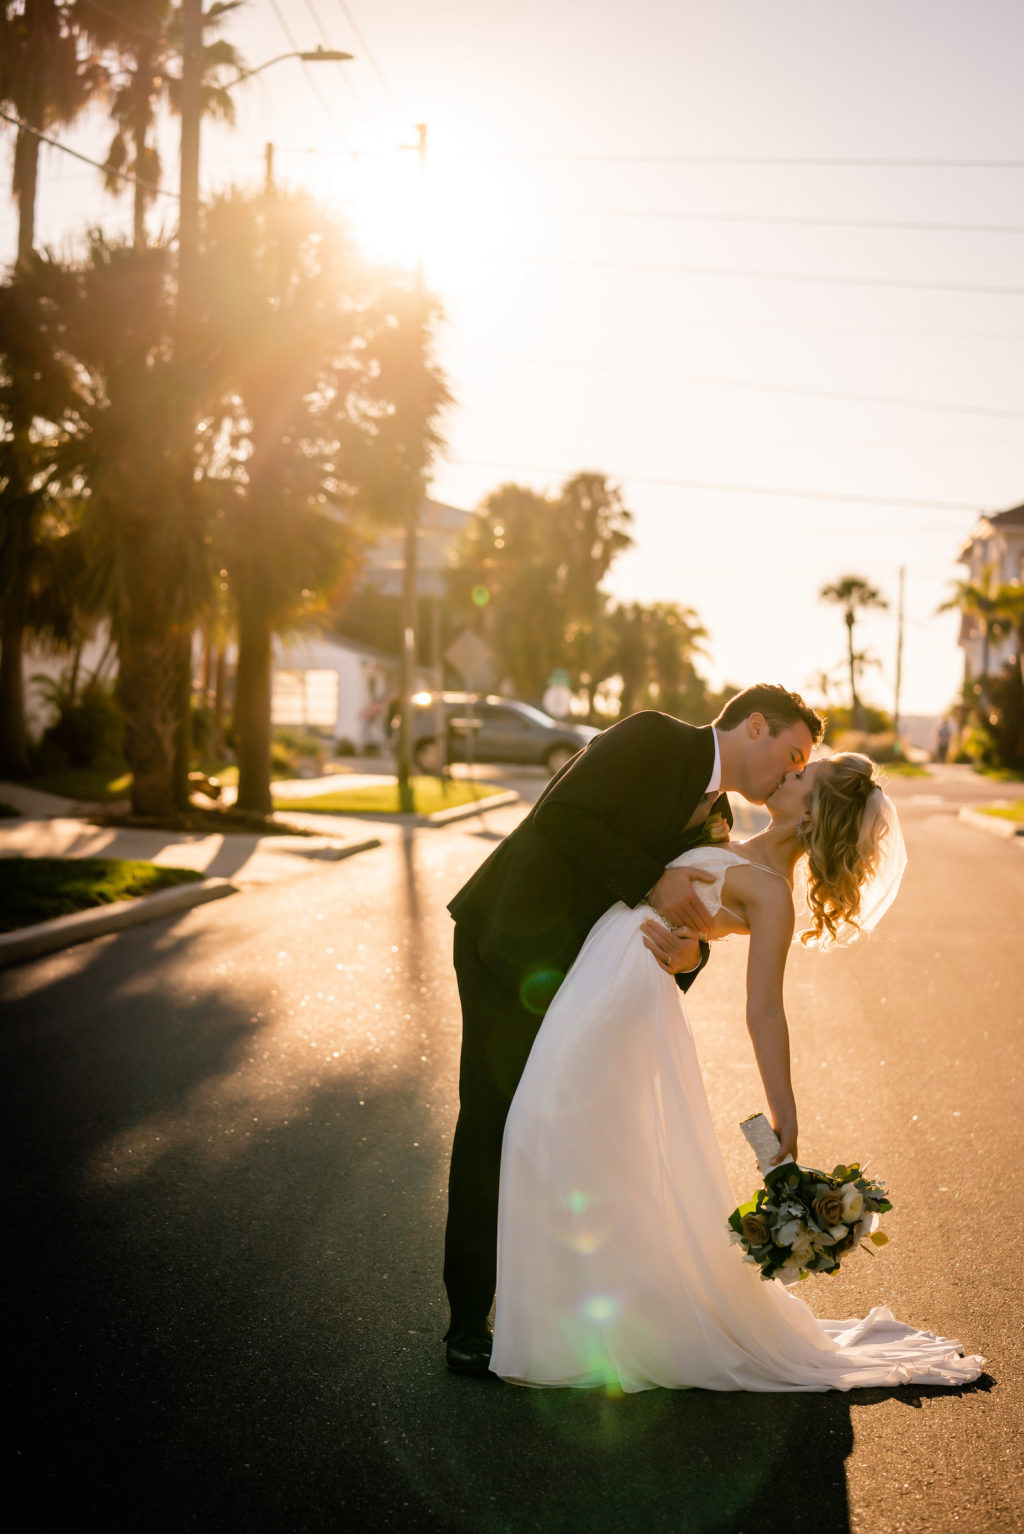 Romantic Groom Dip Kissing Bride Sunset on the Street Wedding Photo | Tampa Bay Wedding Dress Isabel O'Neil Bridal